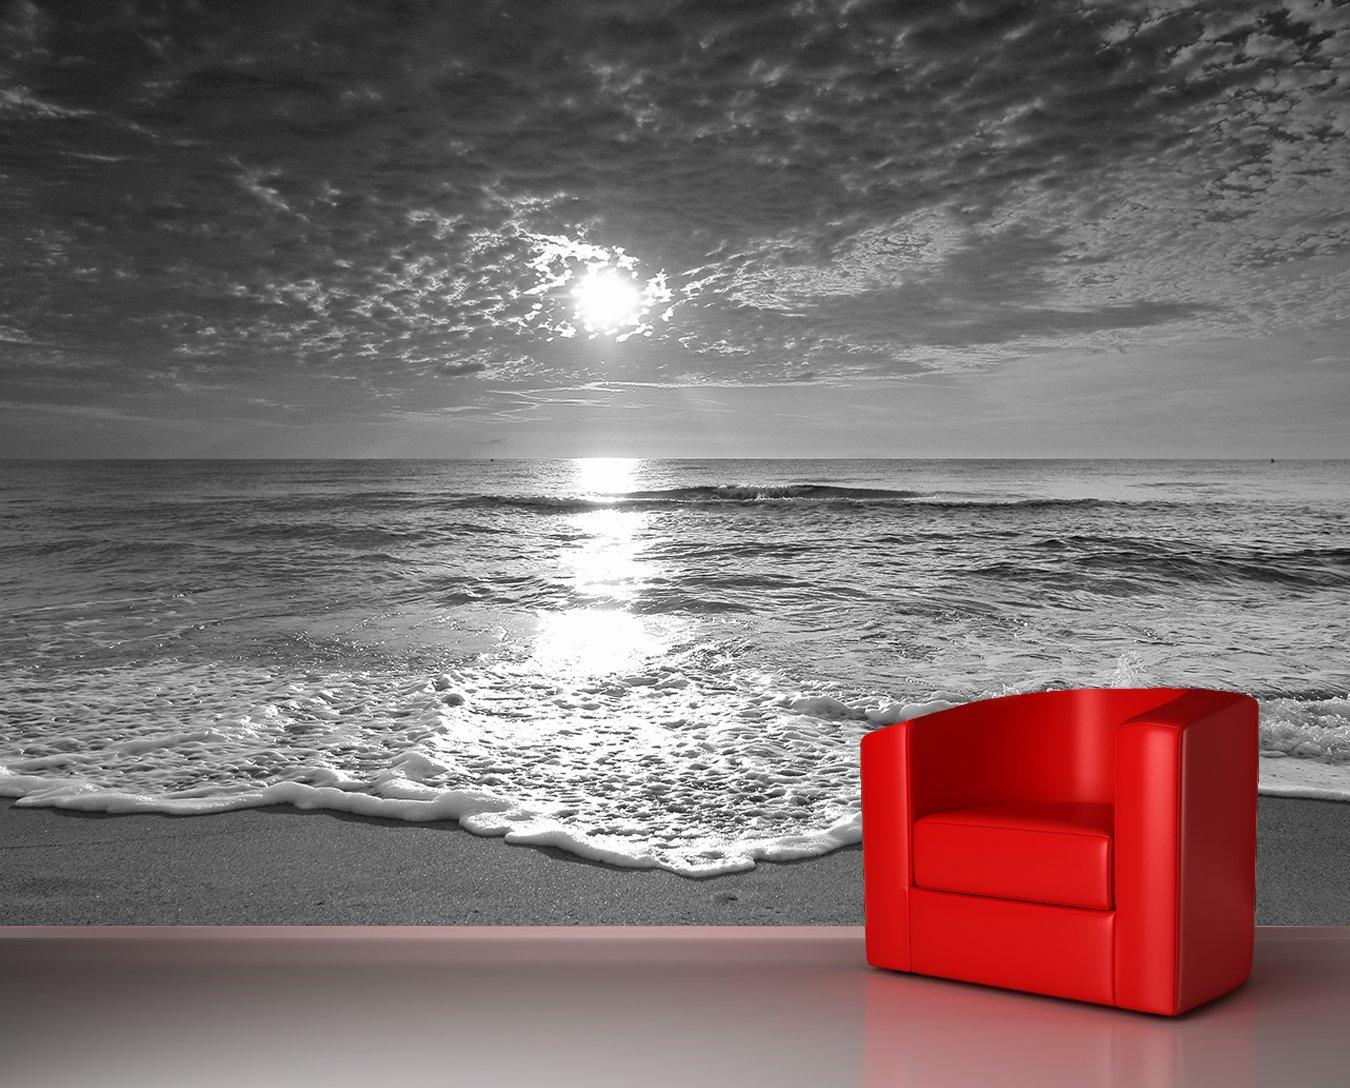 Bilderdepot24 Vlies Fototapete - Strand Sonnenuntergang Sonnenuntergang Sonnenuntergang - schwarz Weiss - 230x150 cm - mit Kleister – Poster – Foto auf Tapete – Wandbild – Wandtapete – Vliestapete B06WPBT41M Wandtattoos & Wandbilder 04a7ae